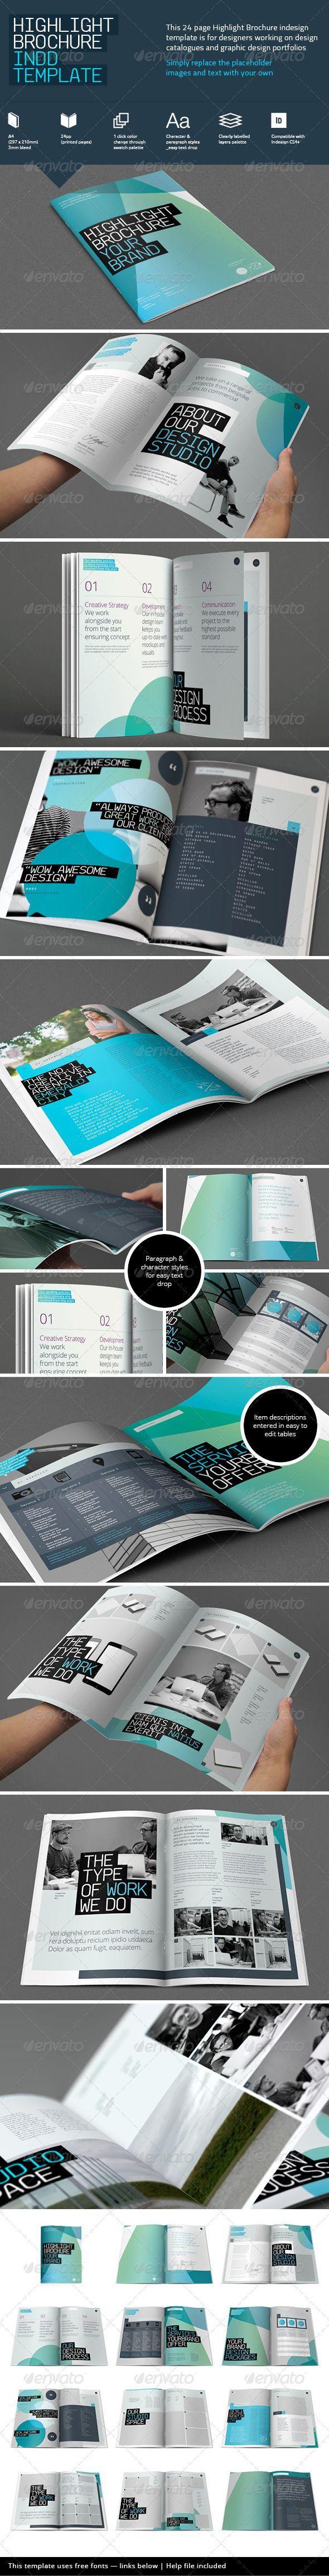 Highlight Brochure Template - Brochures Print Templates